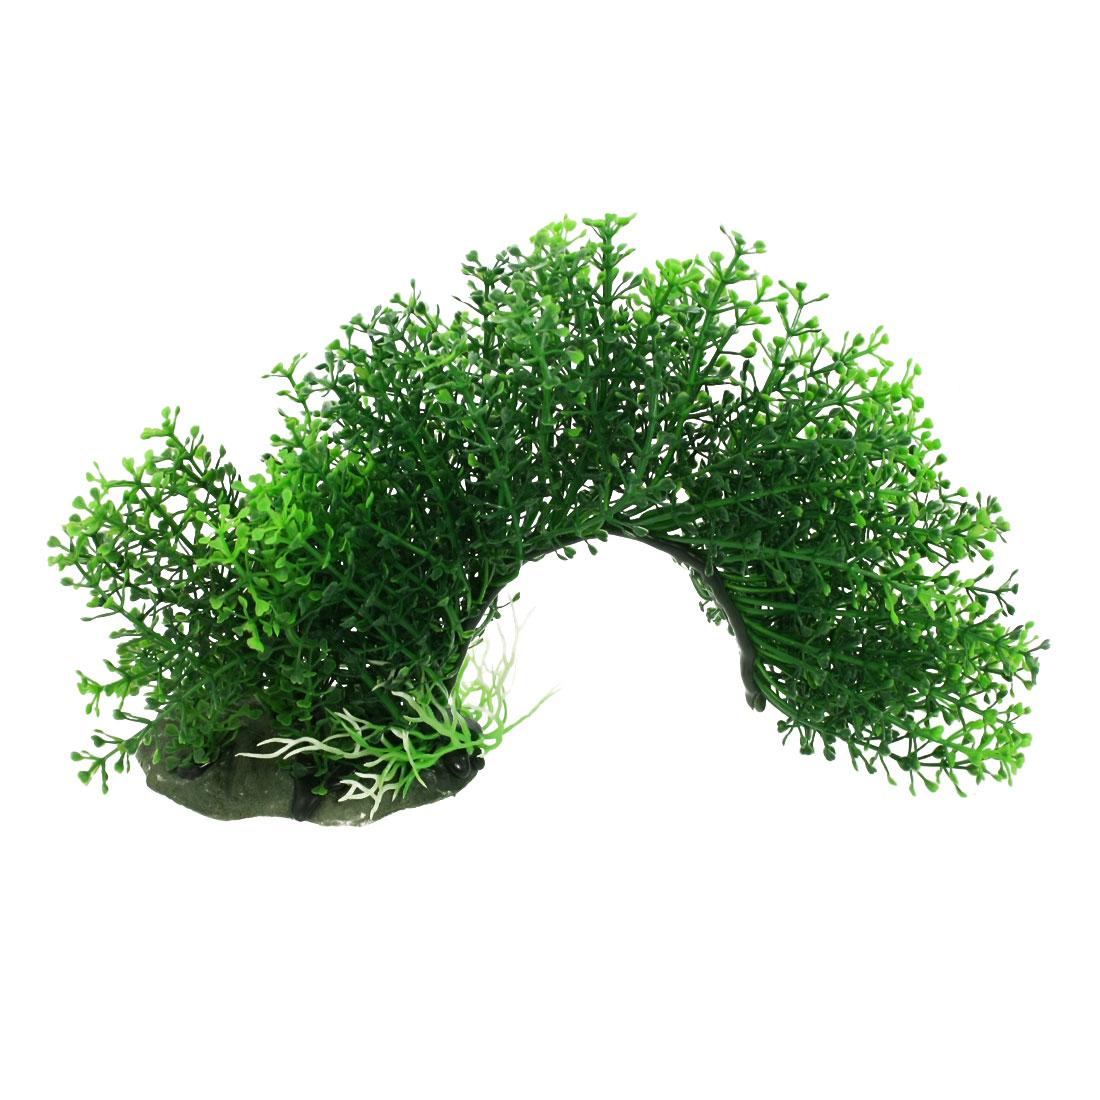 Aquarium Emulational Dark Green Arch Style Plants Decor w Ceramic Base